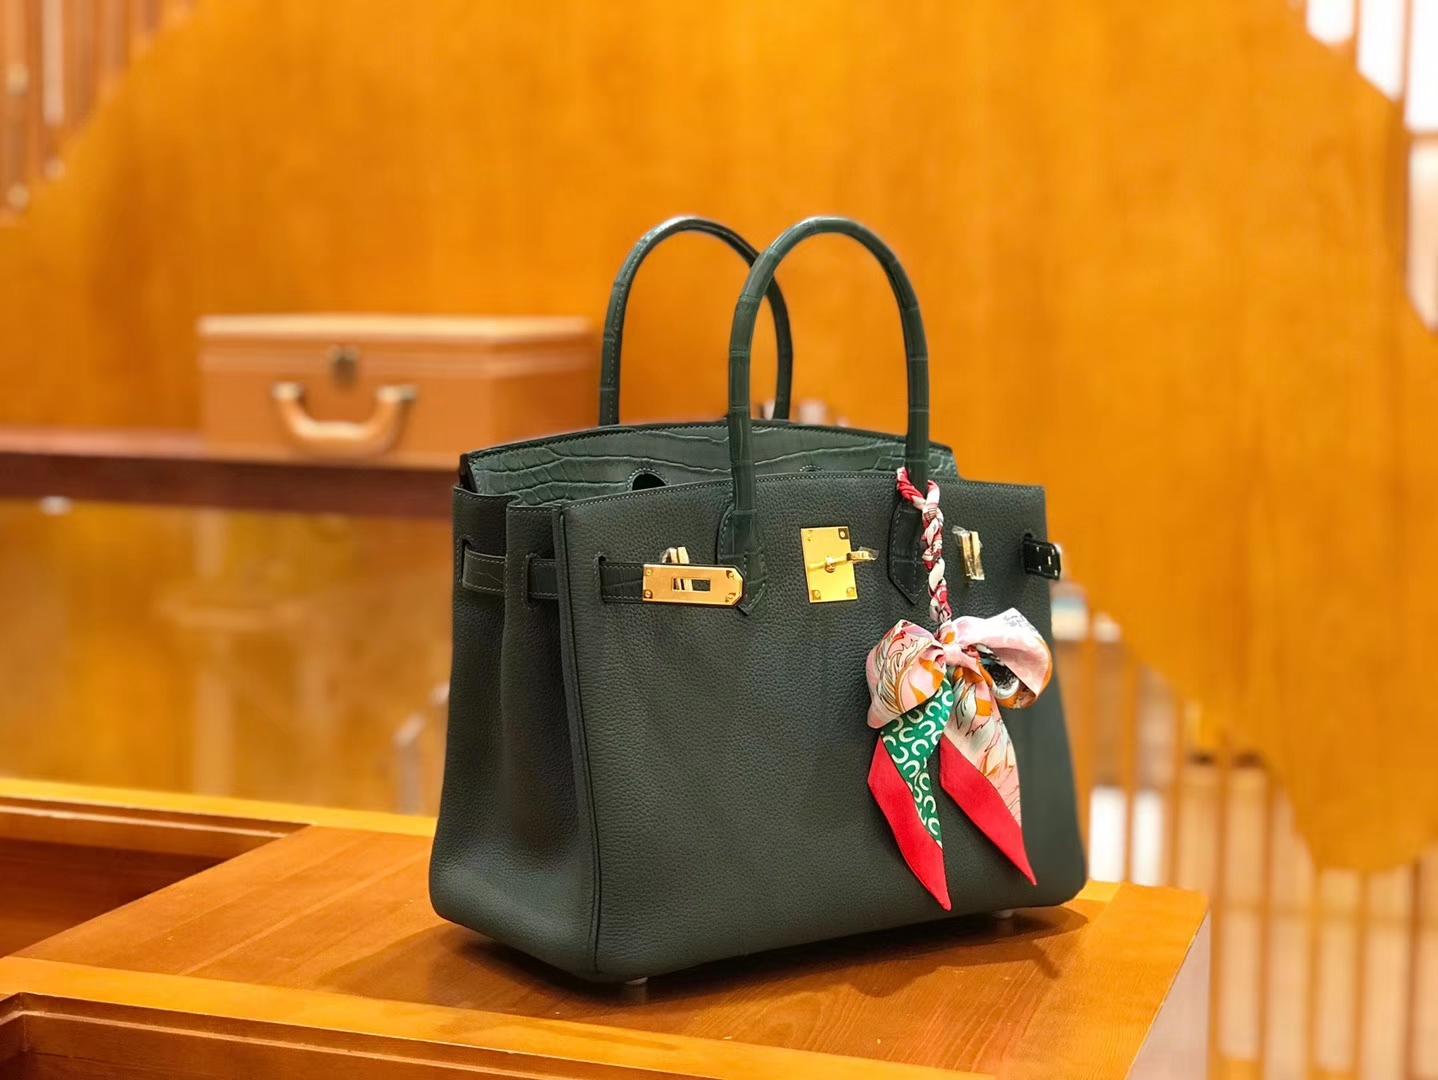 Hermès(爱马仕)Birkin 30cm Touch 松柏绿 鳄鱼皮拼牛皮 全手工缝制